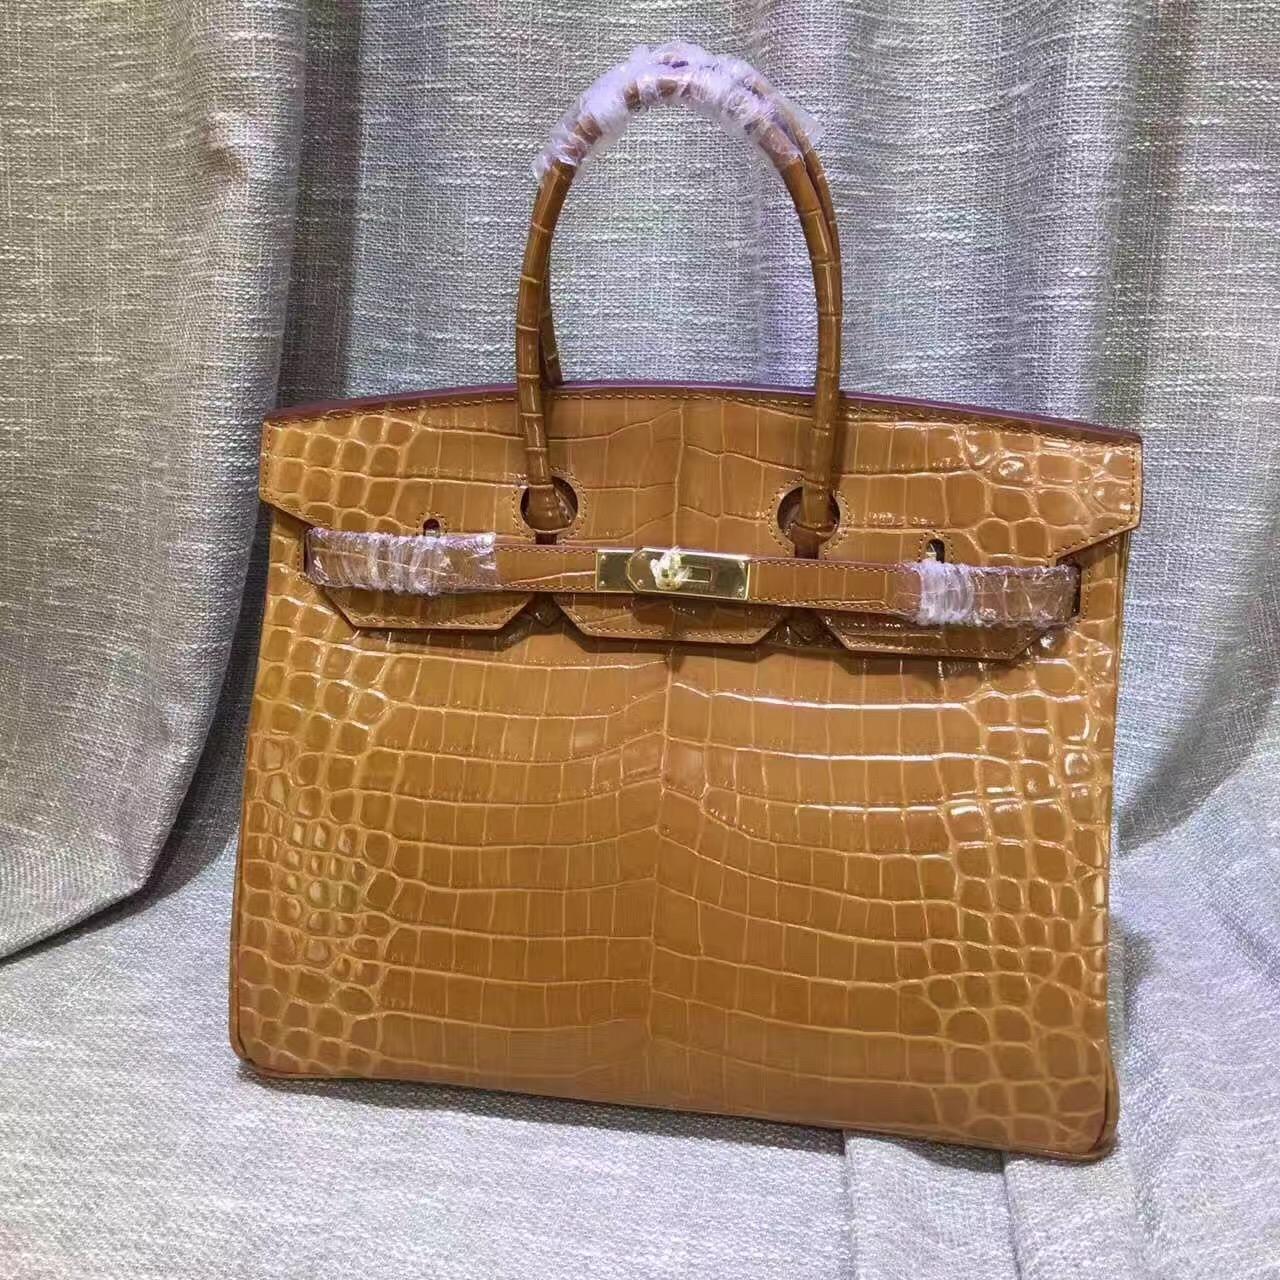 ecb19a4462 Hermes Birkin 35cm Handbag Crocodile Leather Brown Gold